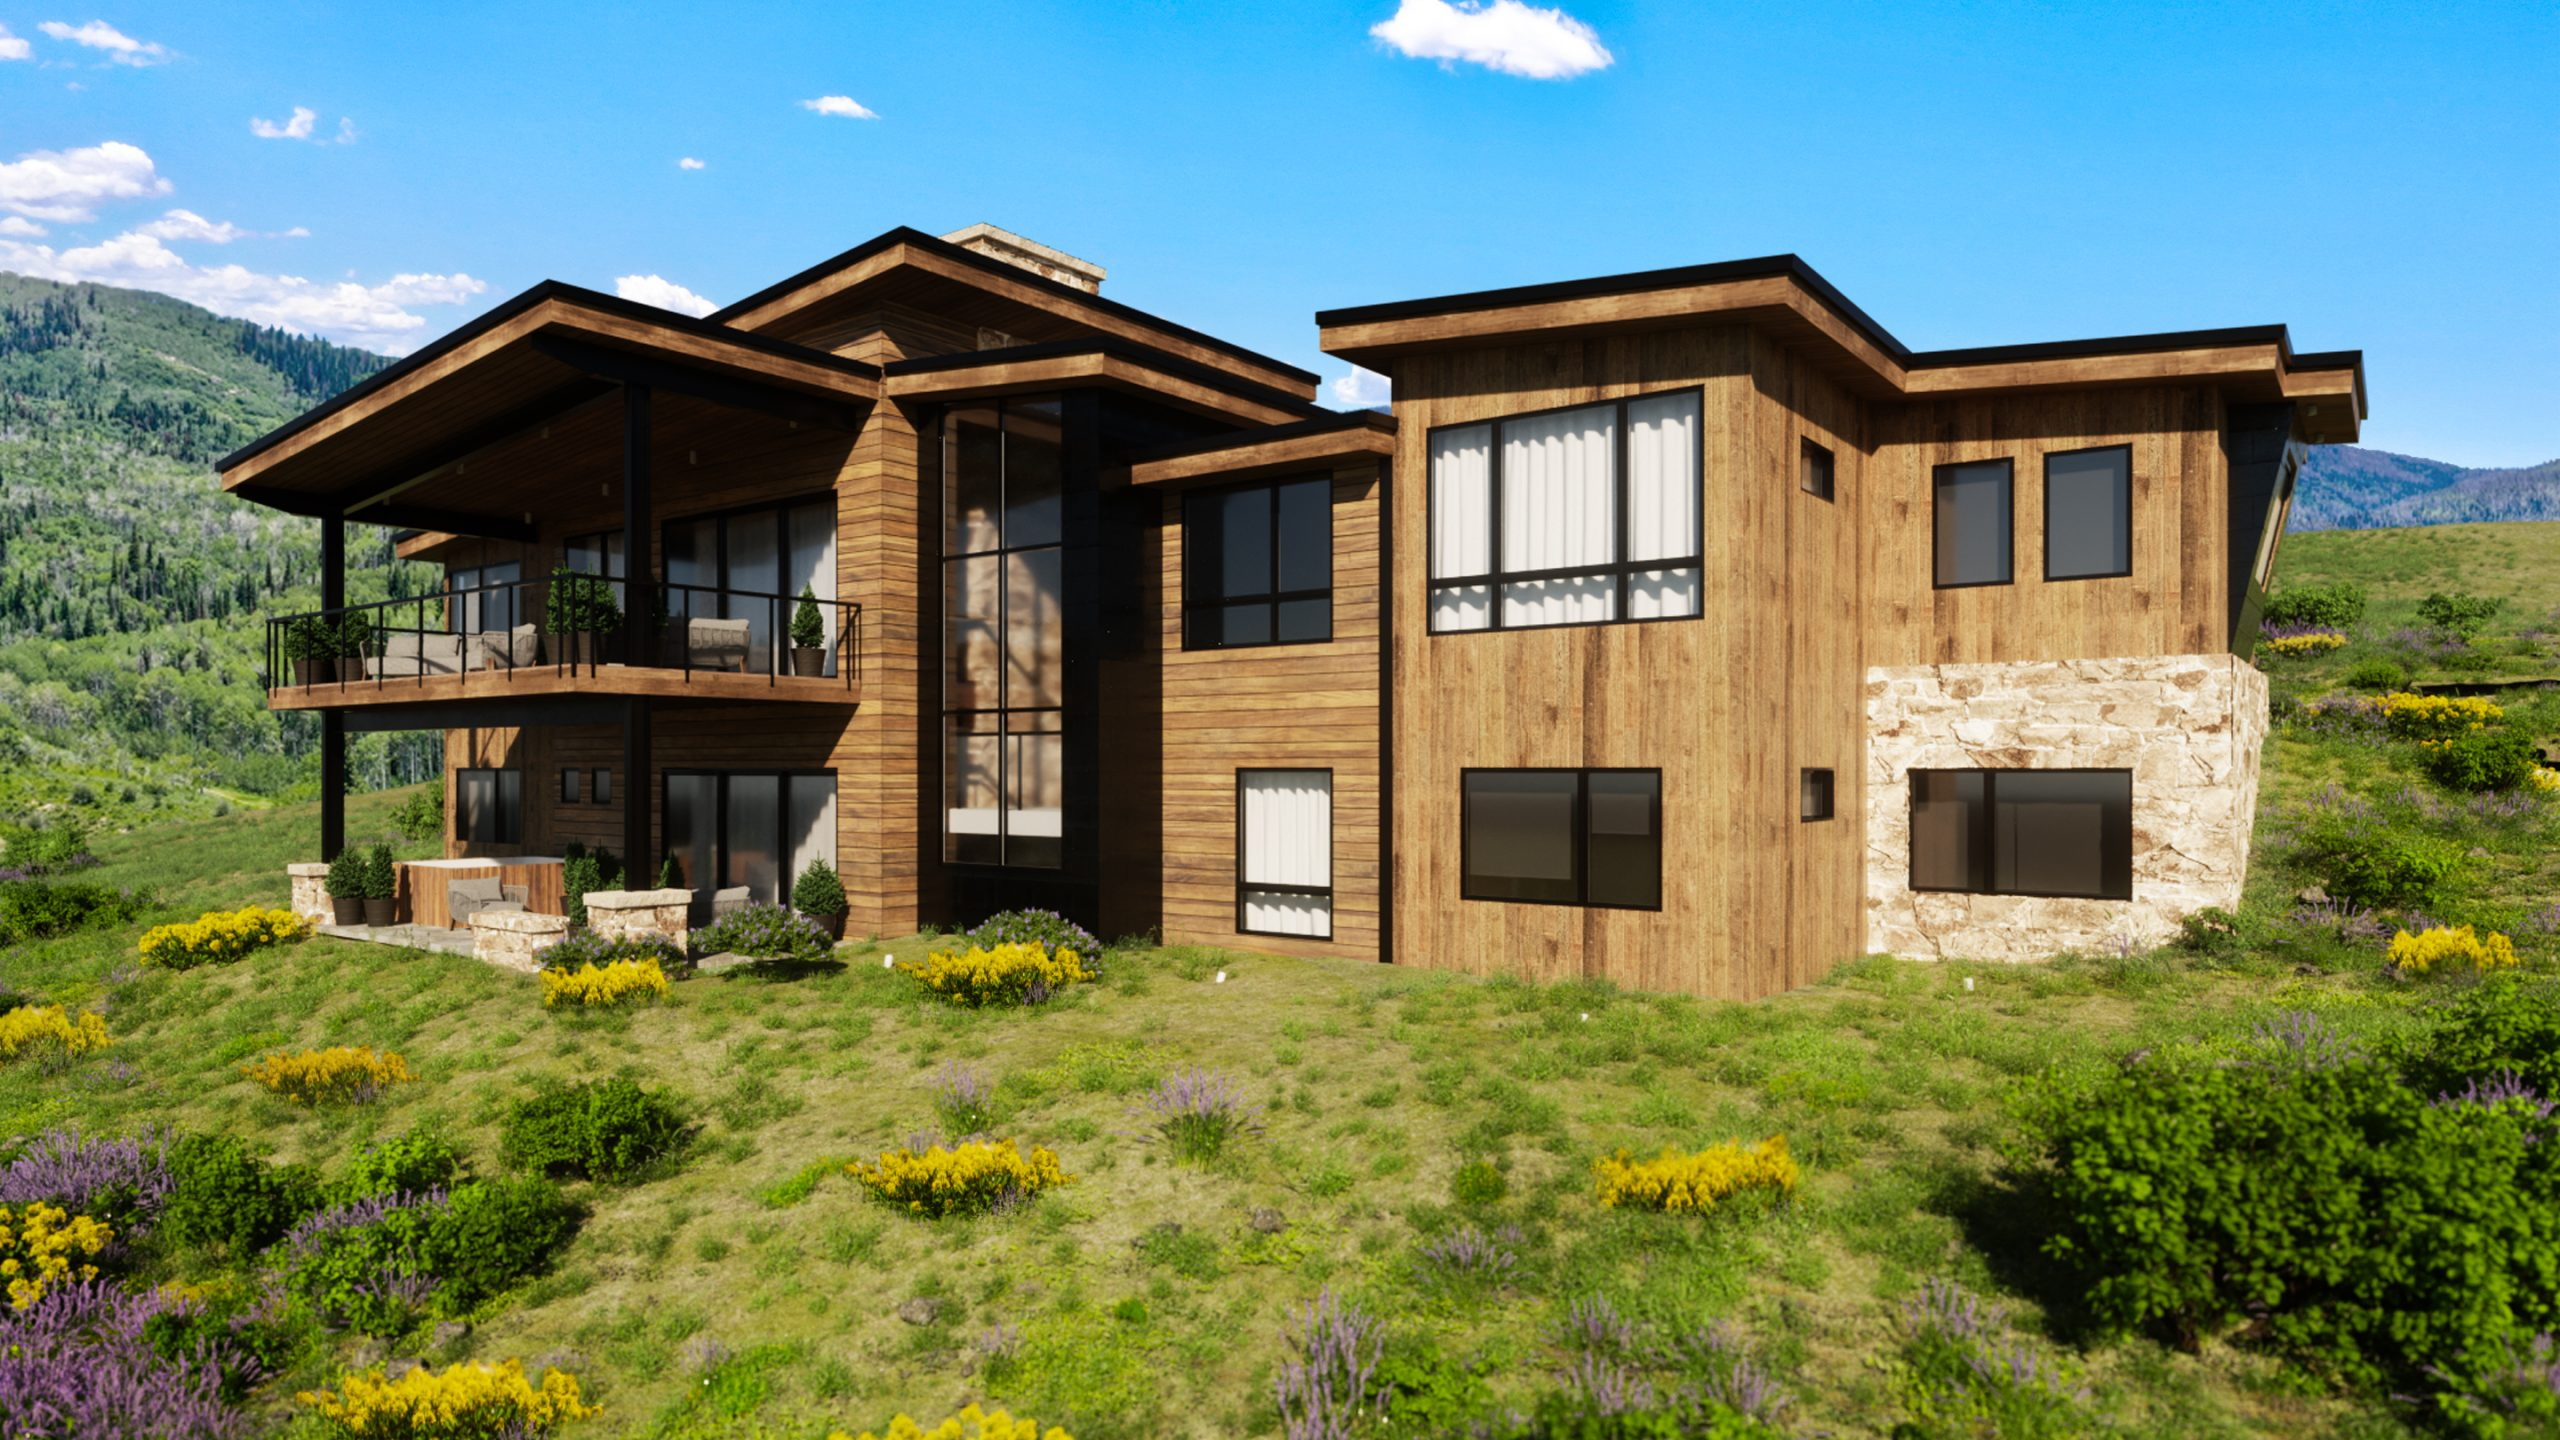 lot 17 rendering 3 scaled - Construction Update: Market Home Spotlight